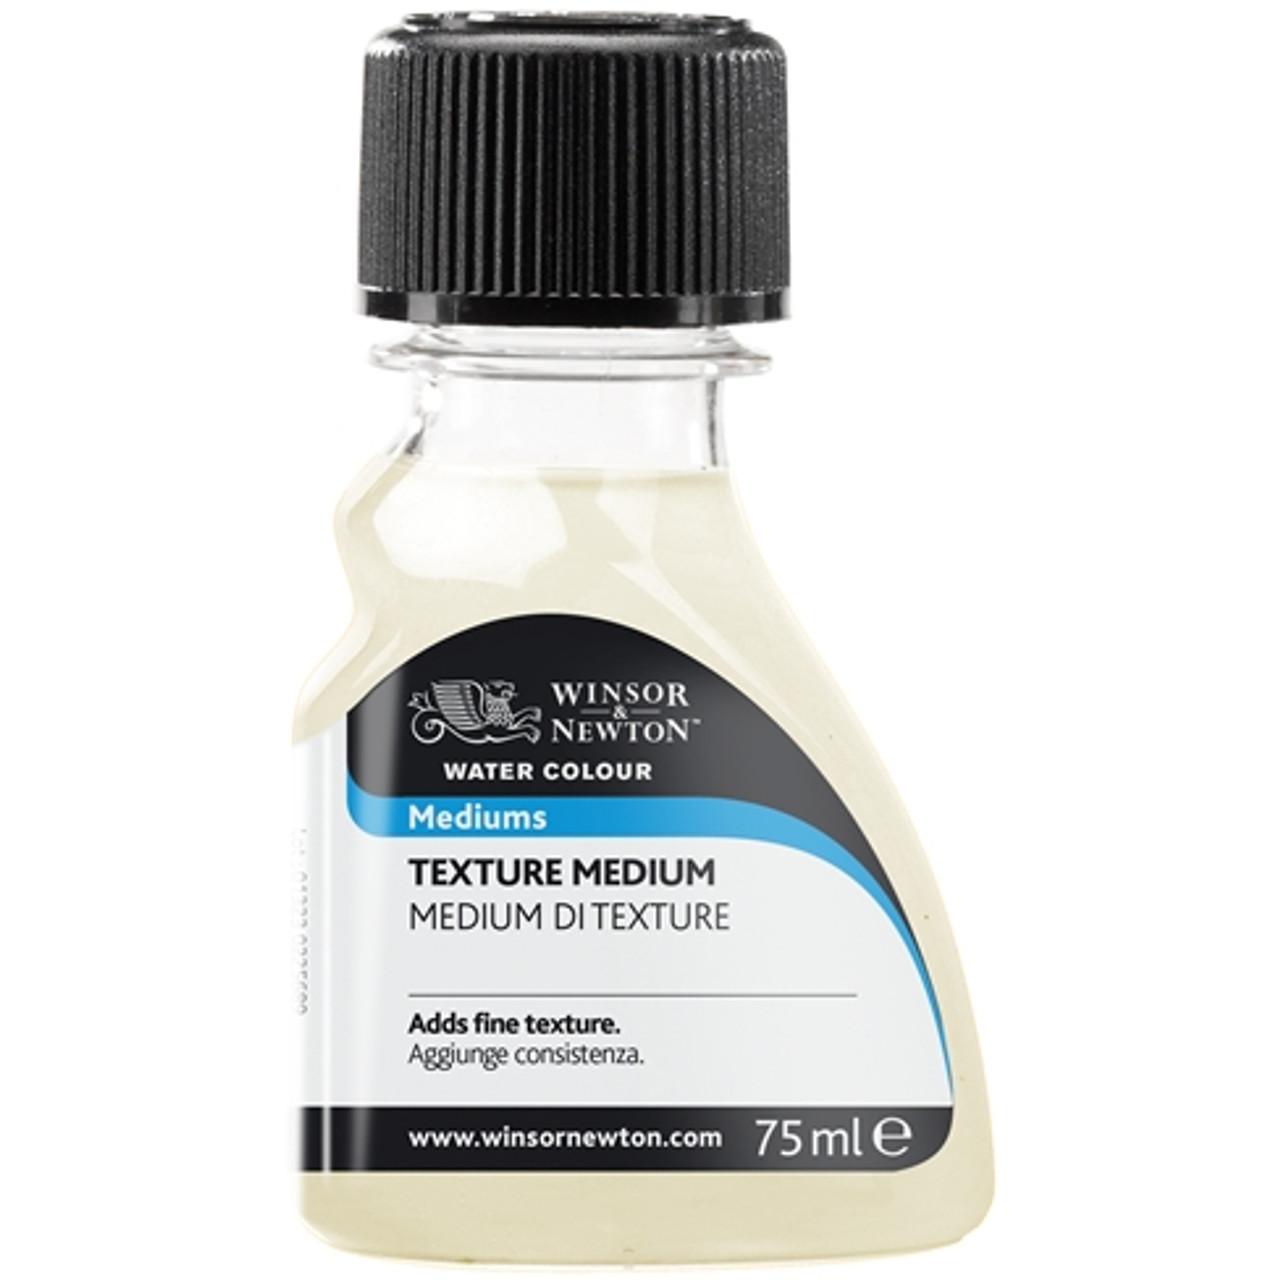 Texture Medium, 75ml